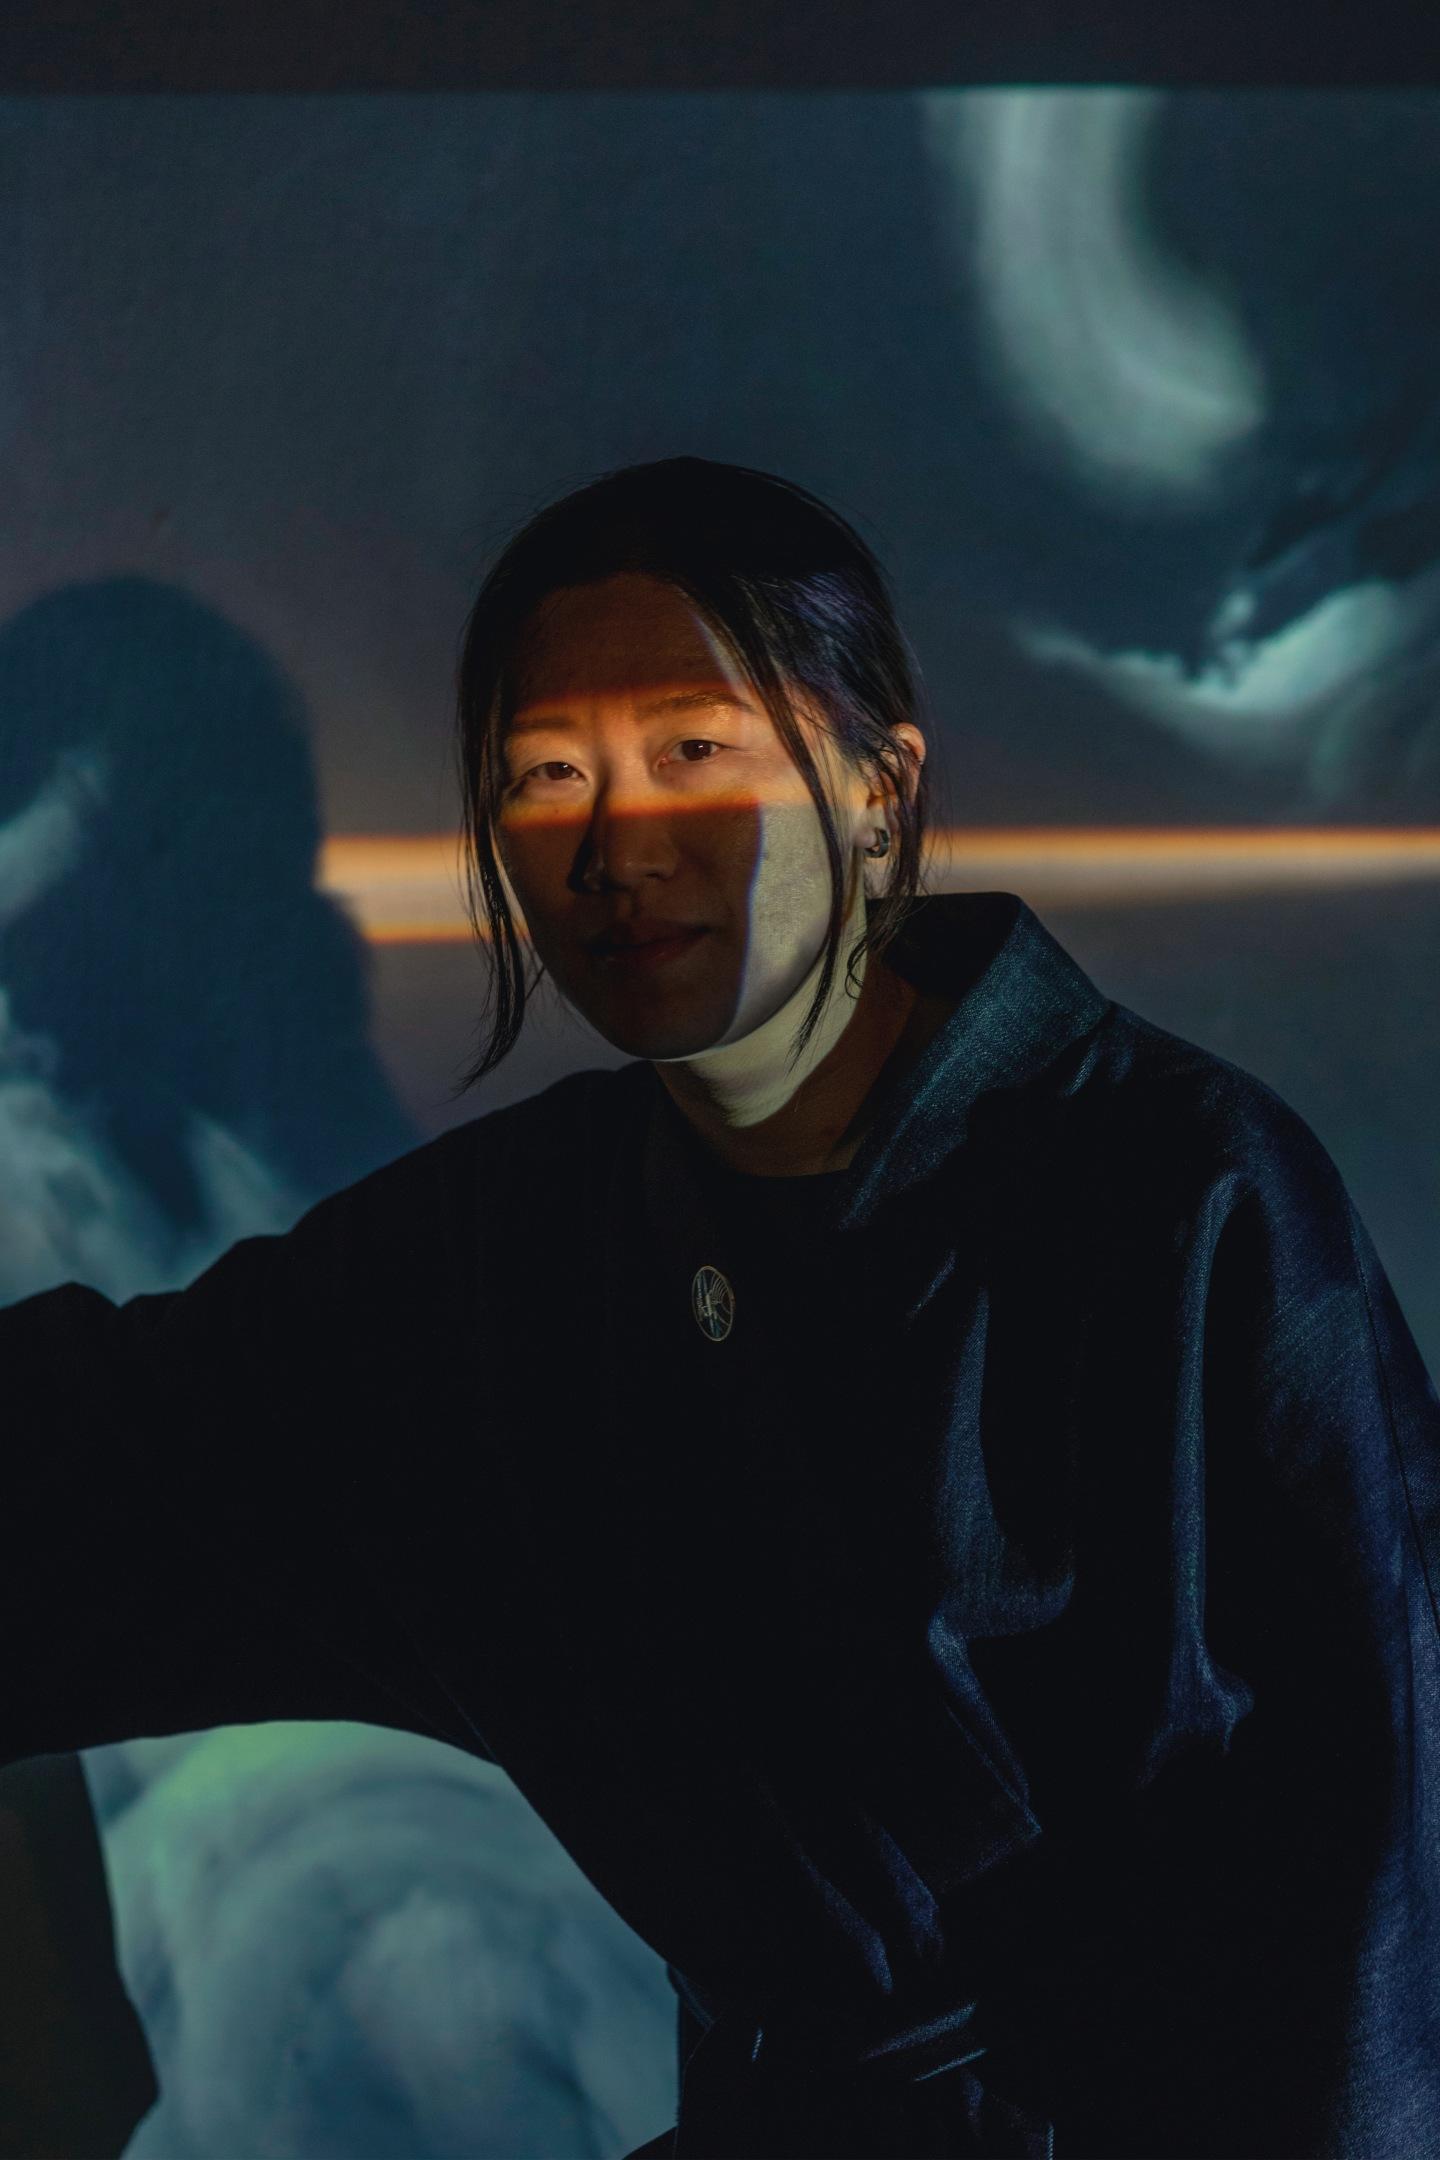 Artist Dyan Jong Moves Time with Light